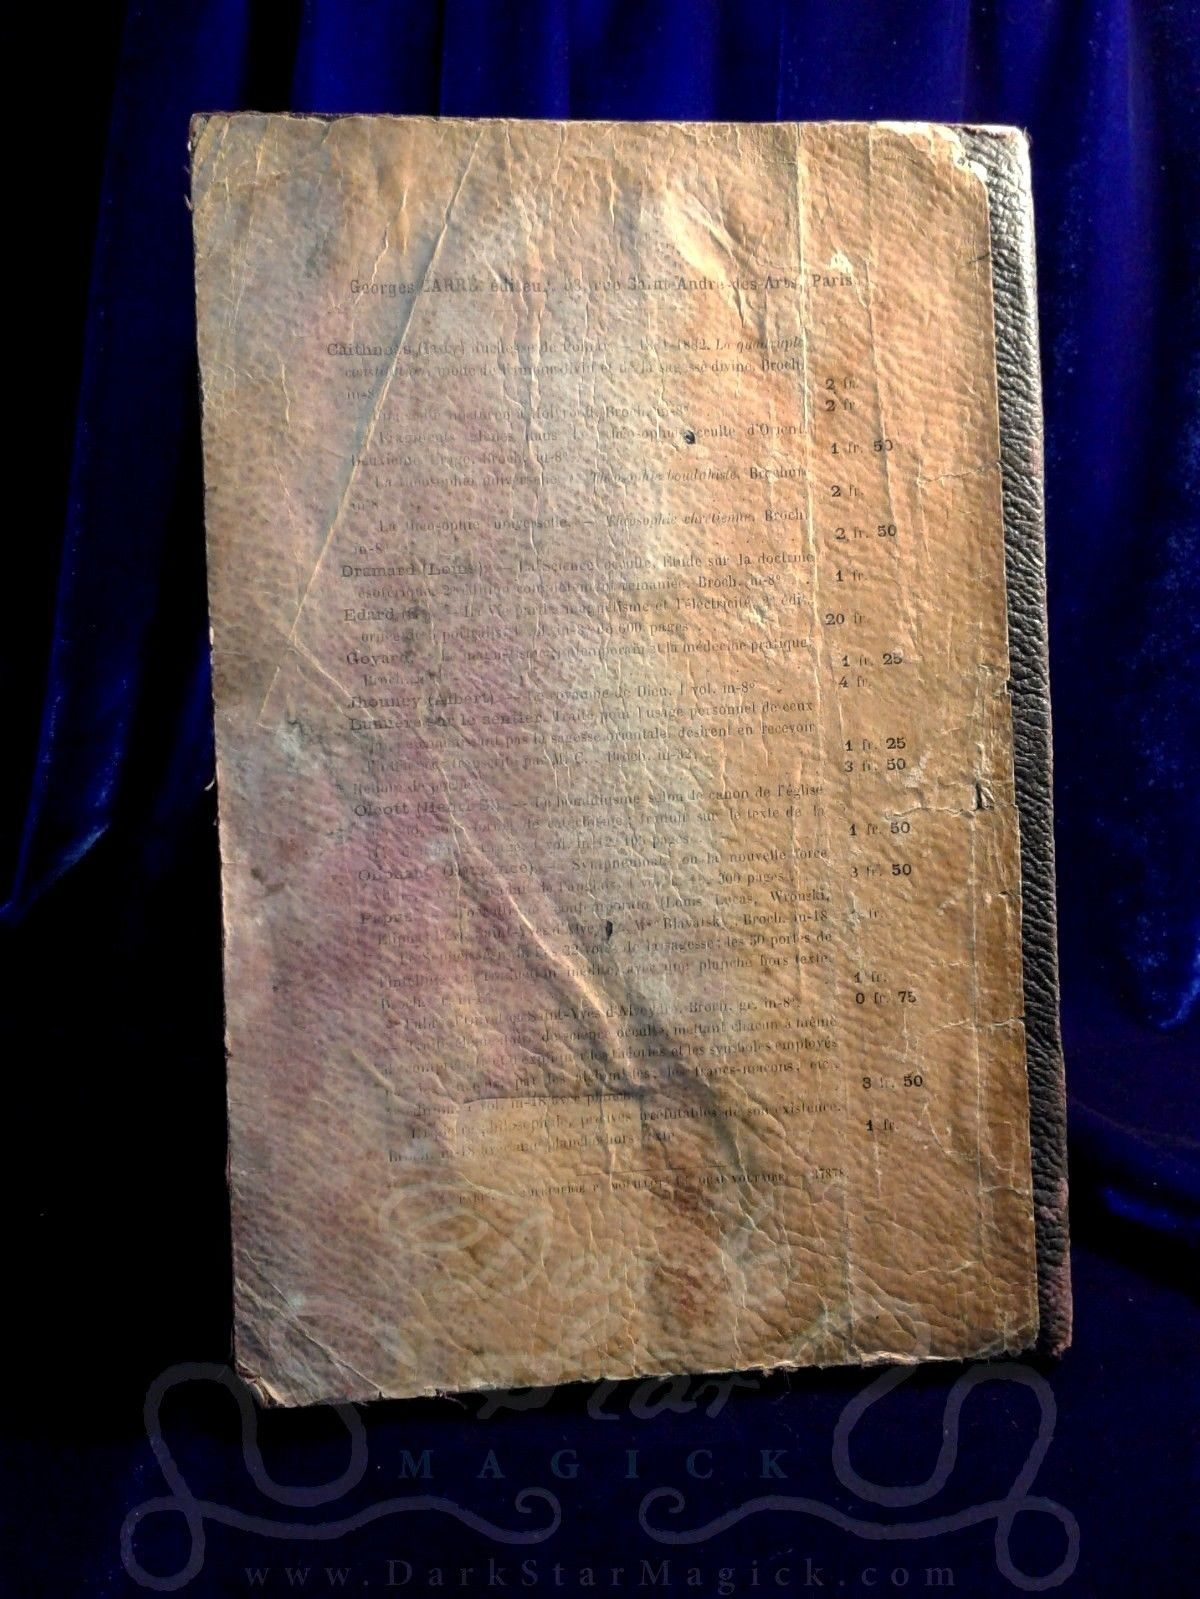 1889 Le Tarot des Bohemiens FIRST EDITION Papus Gerard Encausse VERY RARE occult